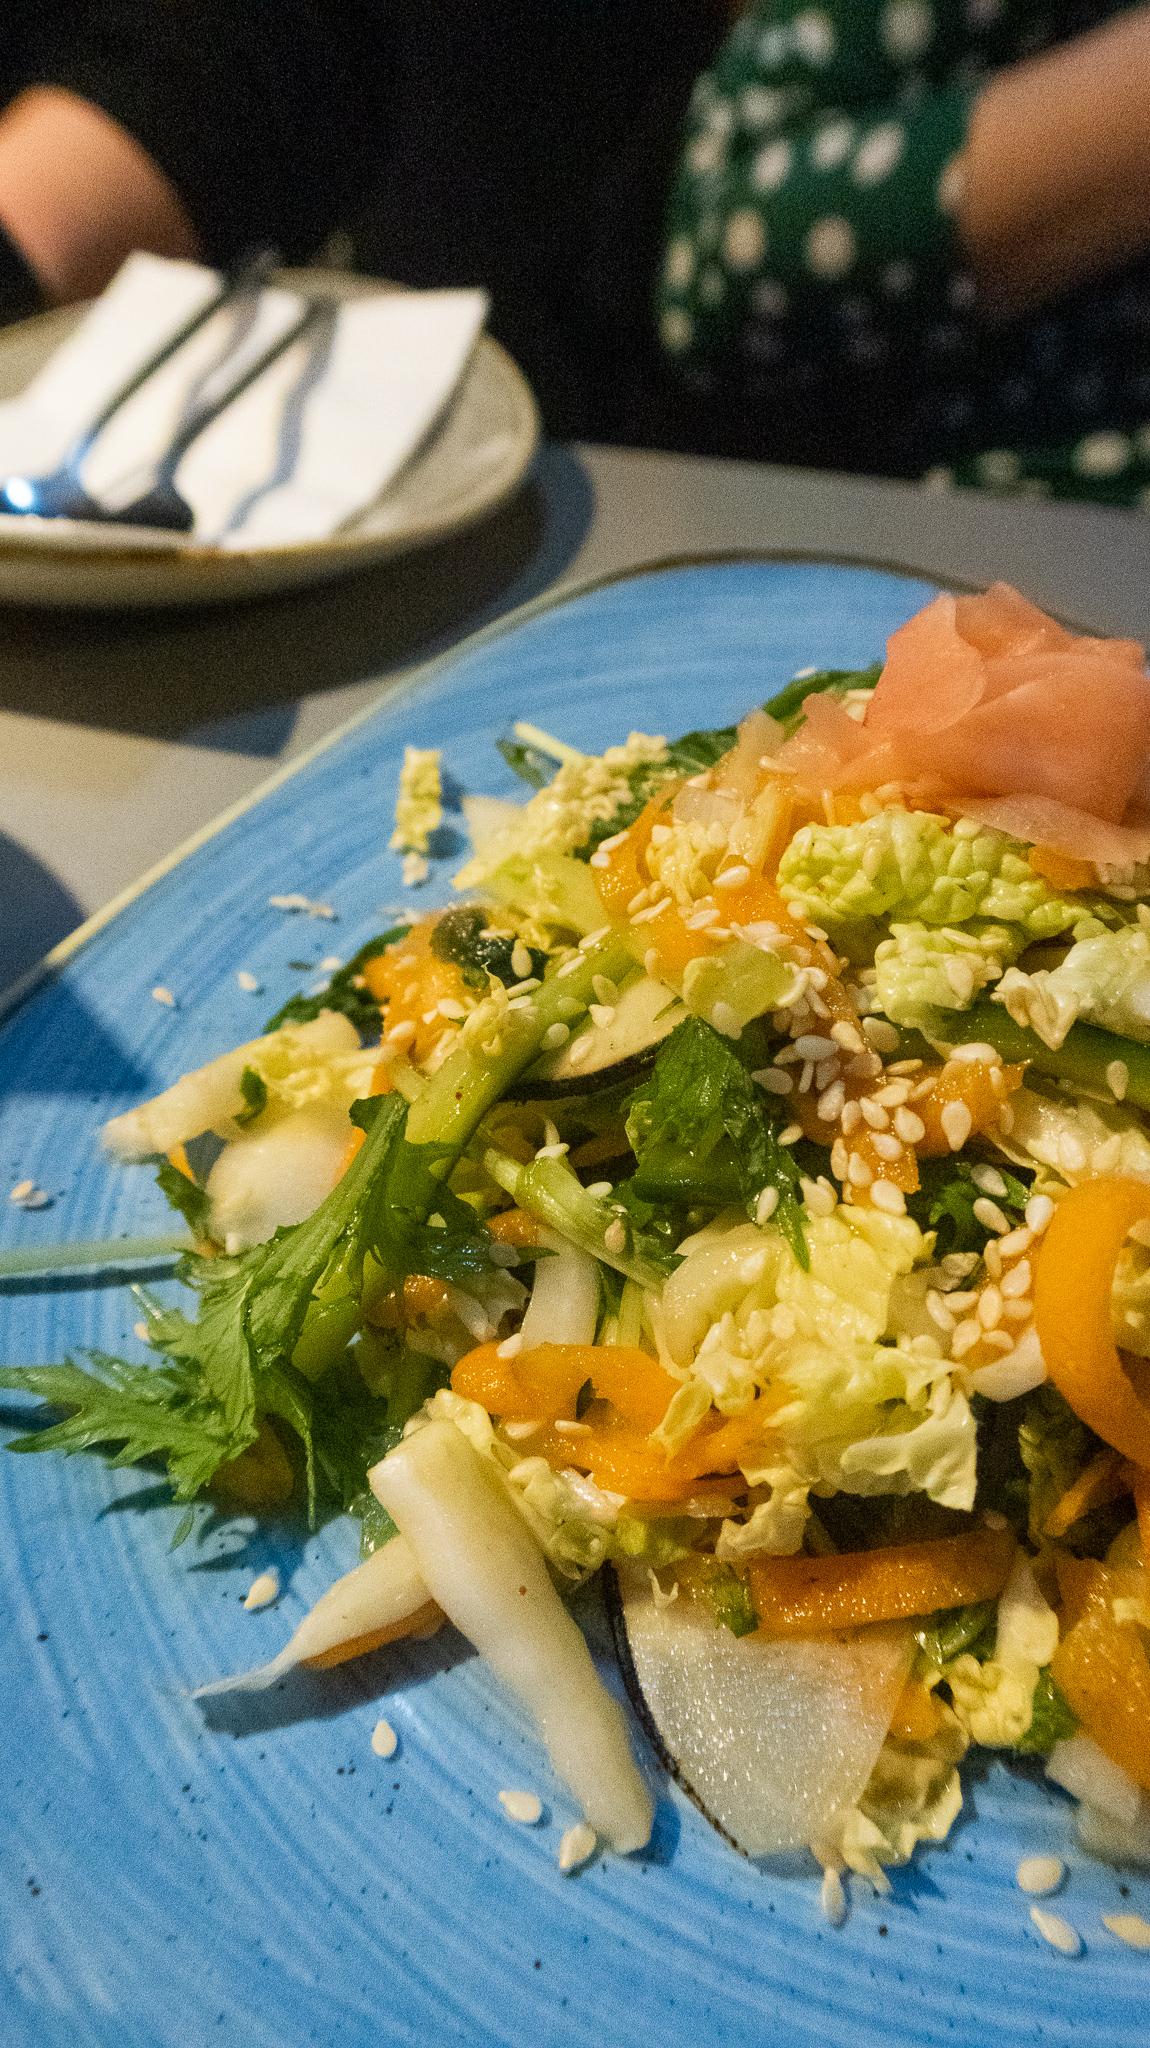 Japanese Salad £5.95